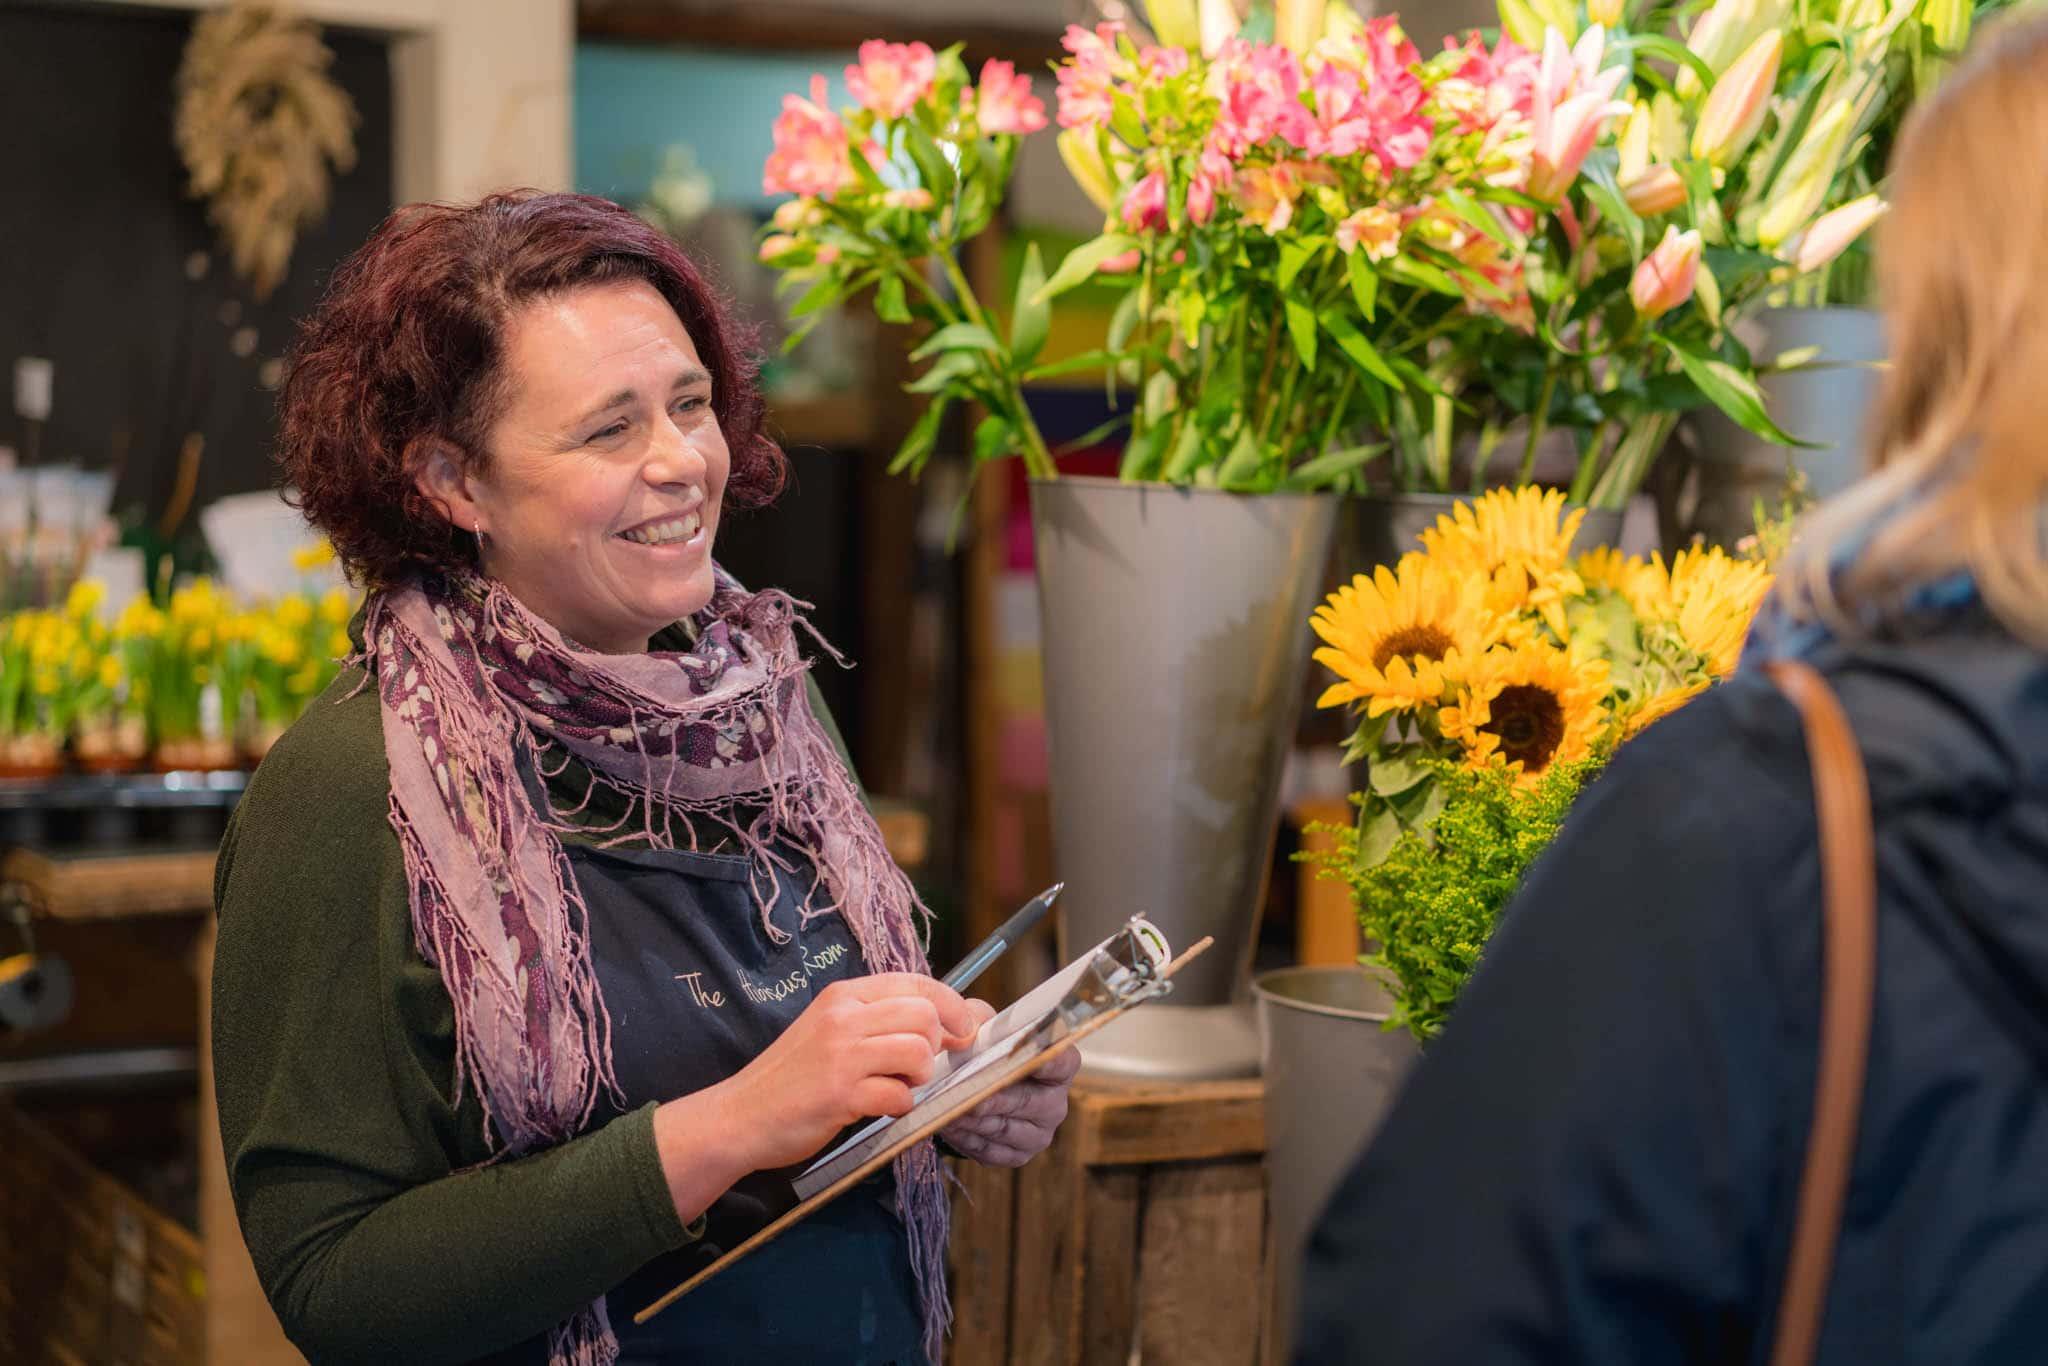 florist smiling at customer